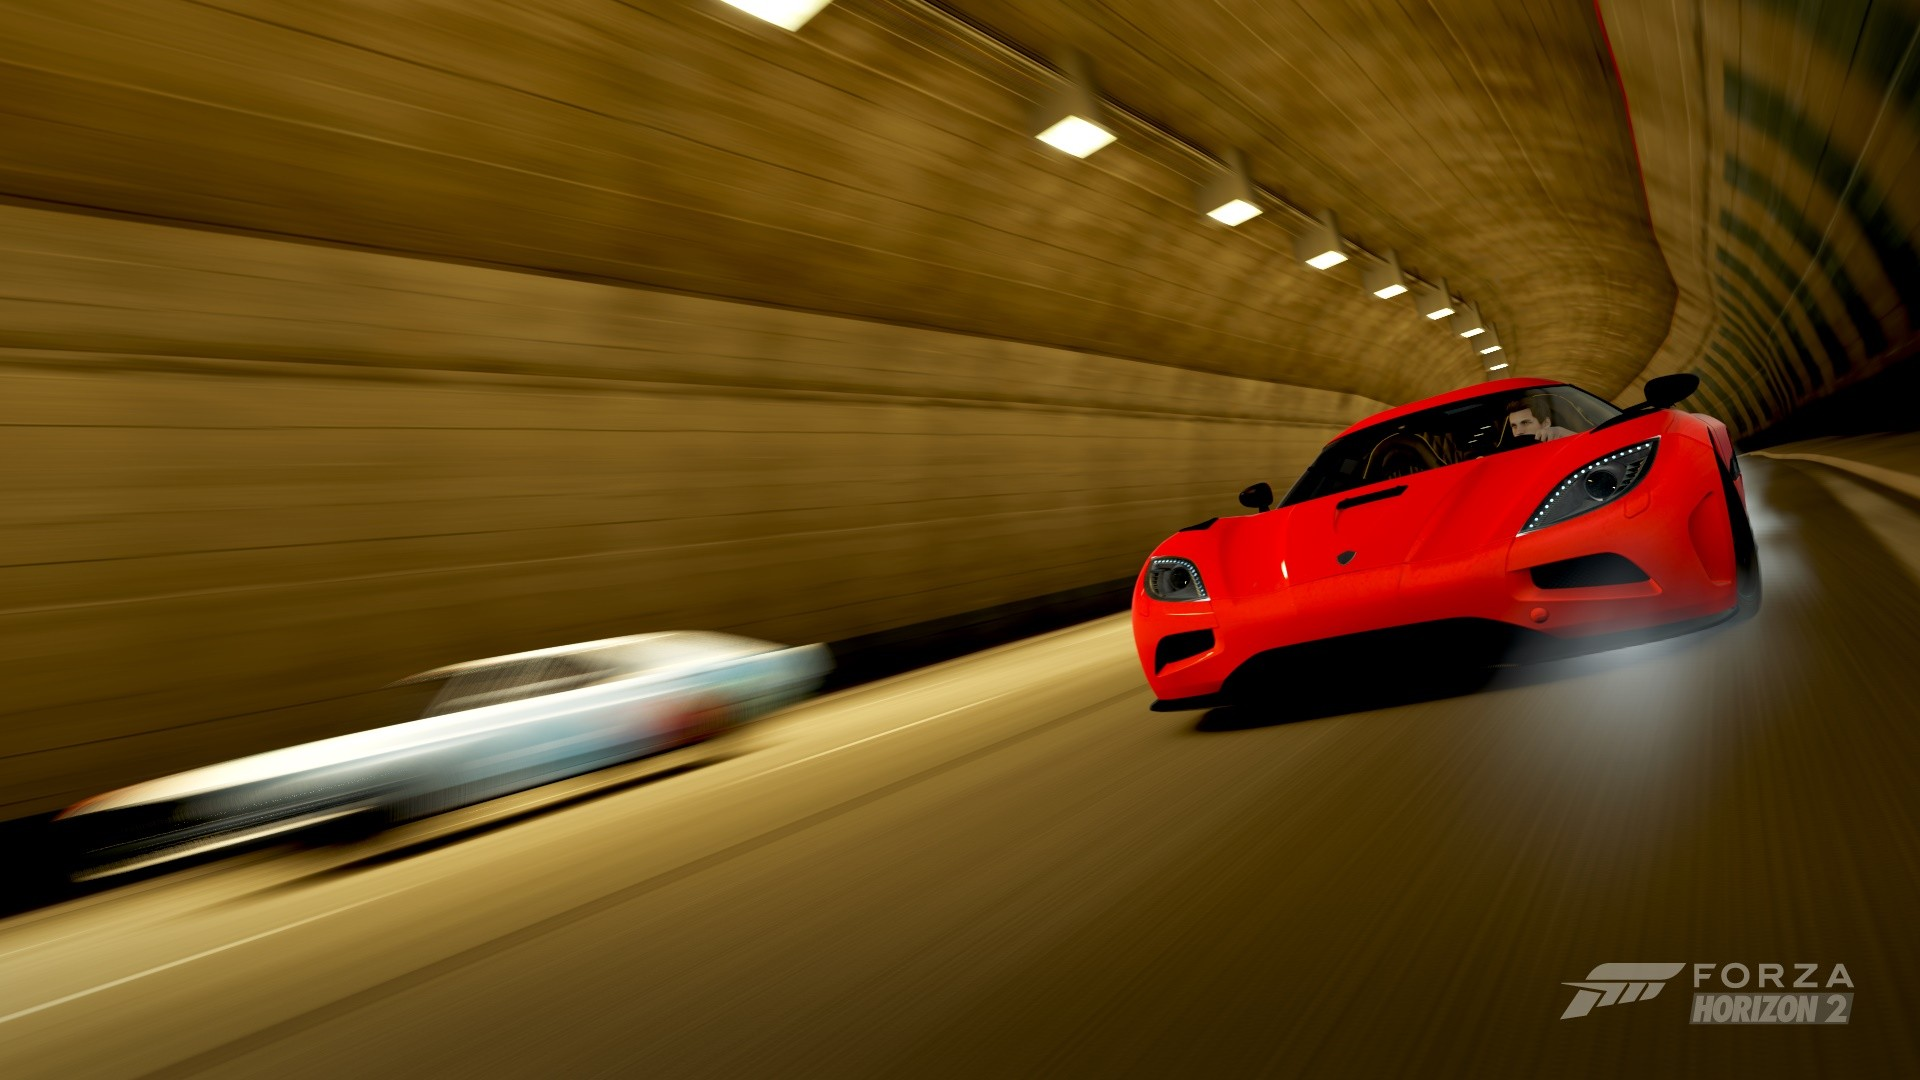 General 1920x1080 Forza Horizon 2 car supercars Koenigsegg Agera video games